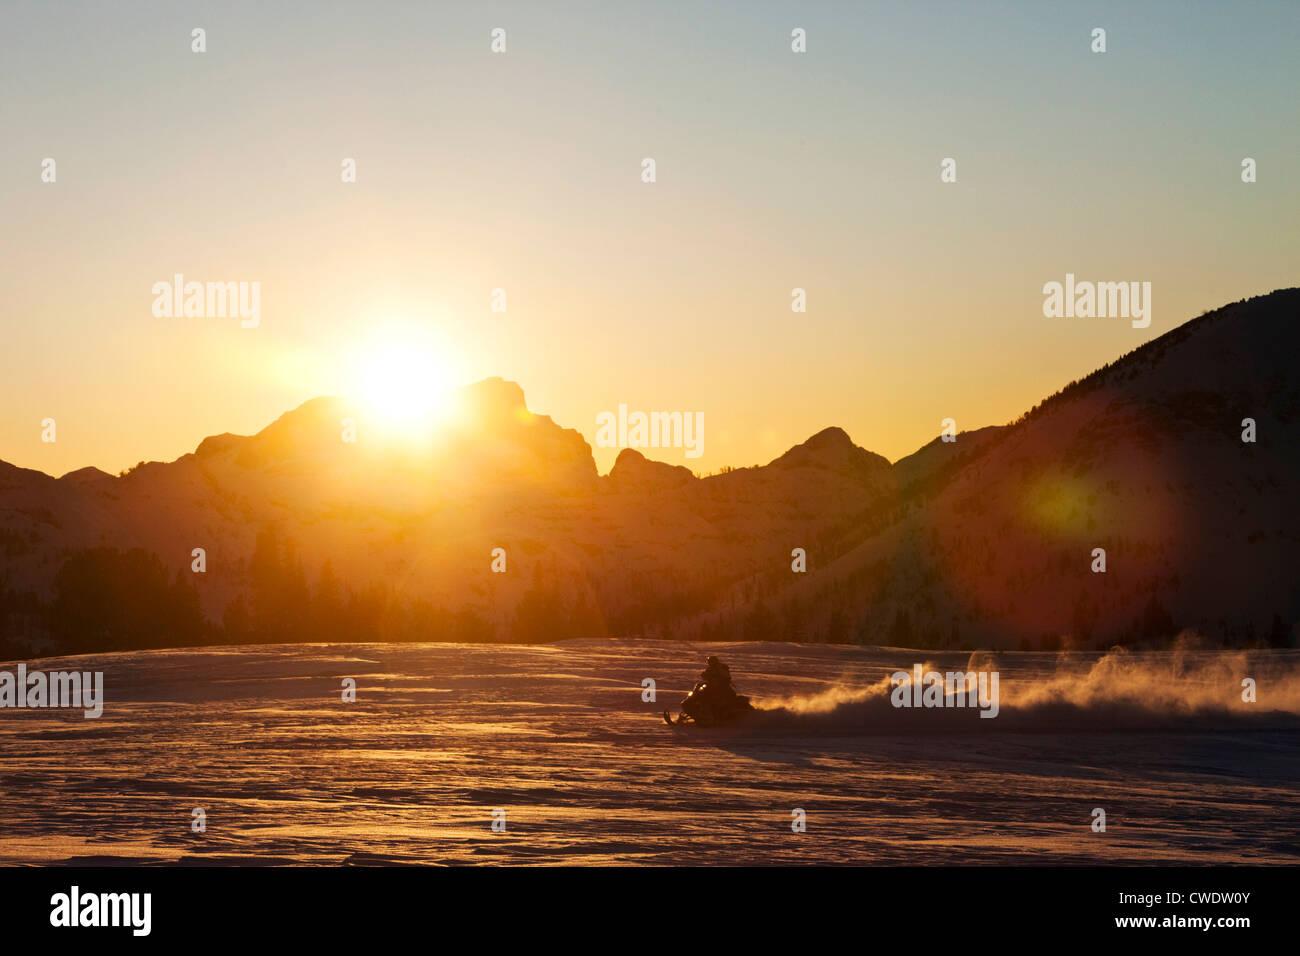 Ein sportlicher junger Mann Motorschlitten bei Sonnenuntergang in Montana. Stockbild